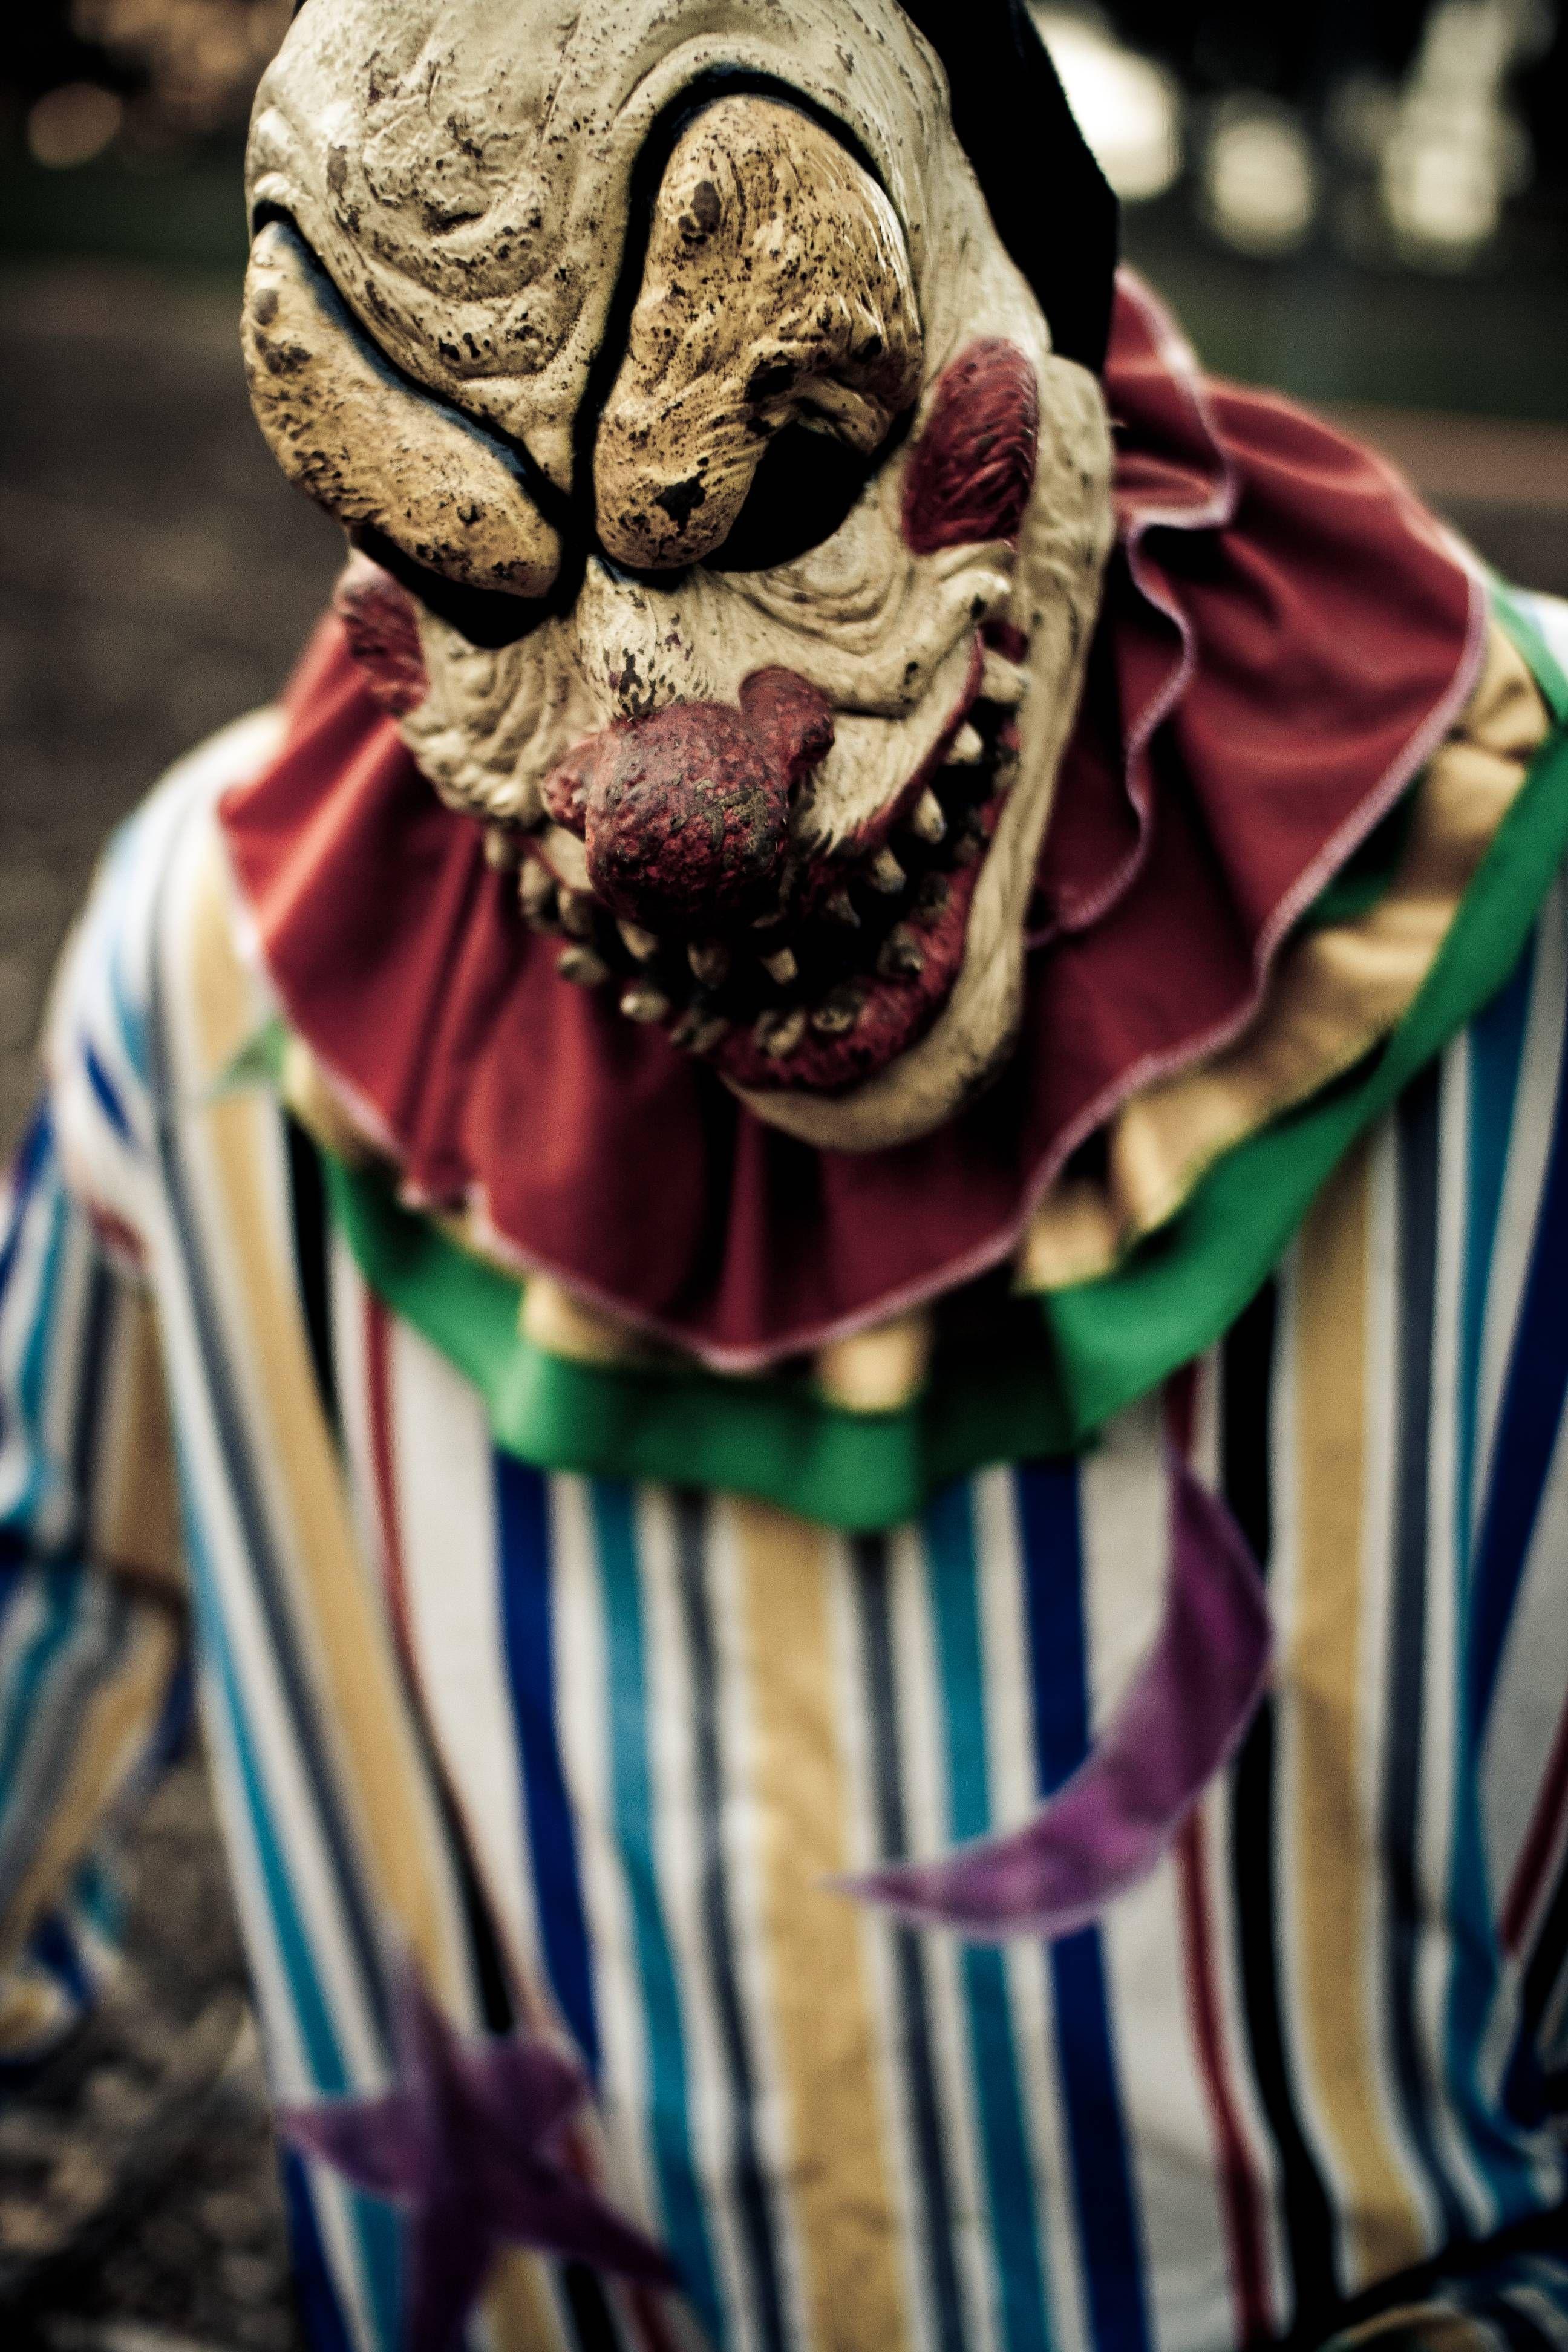 Halloween 2020 Balboa Park The Haunted Trail  Balboa Park | Halloween haunted house diy